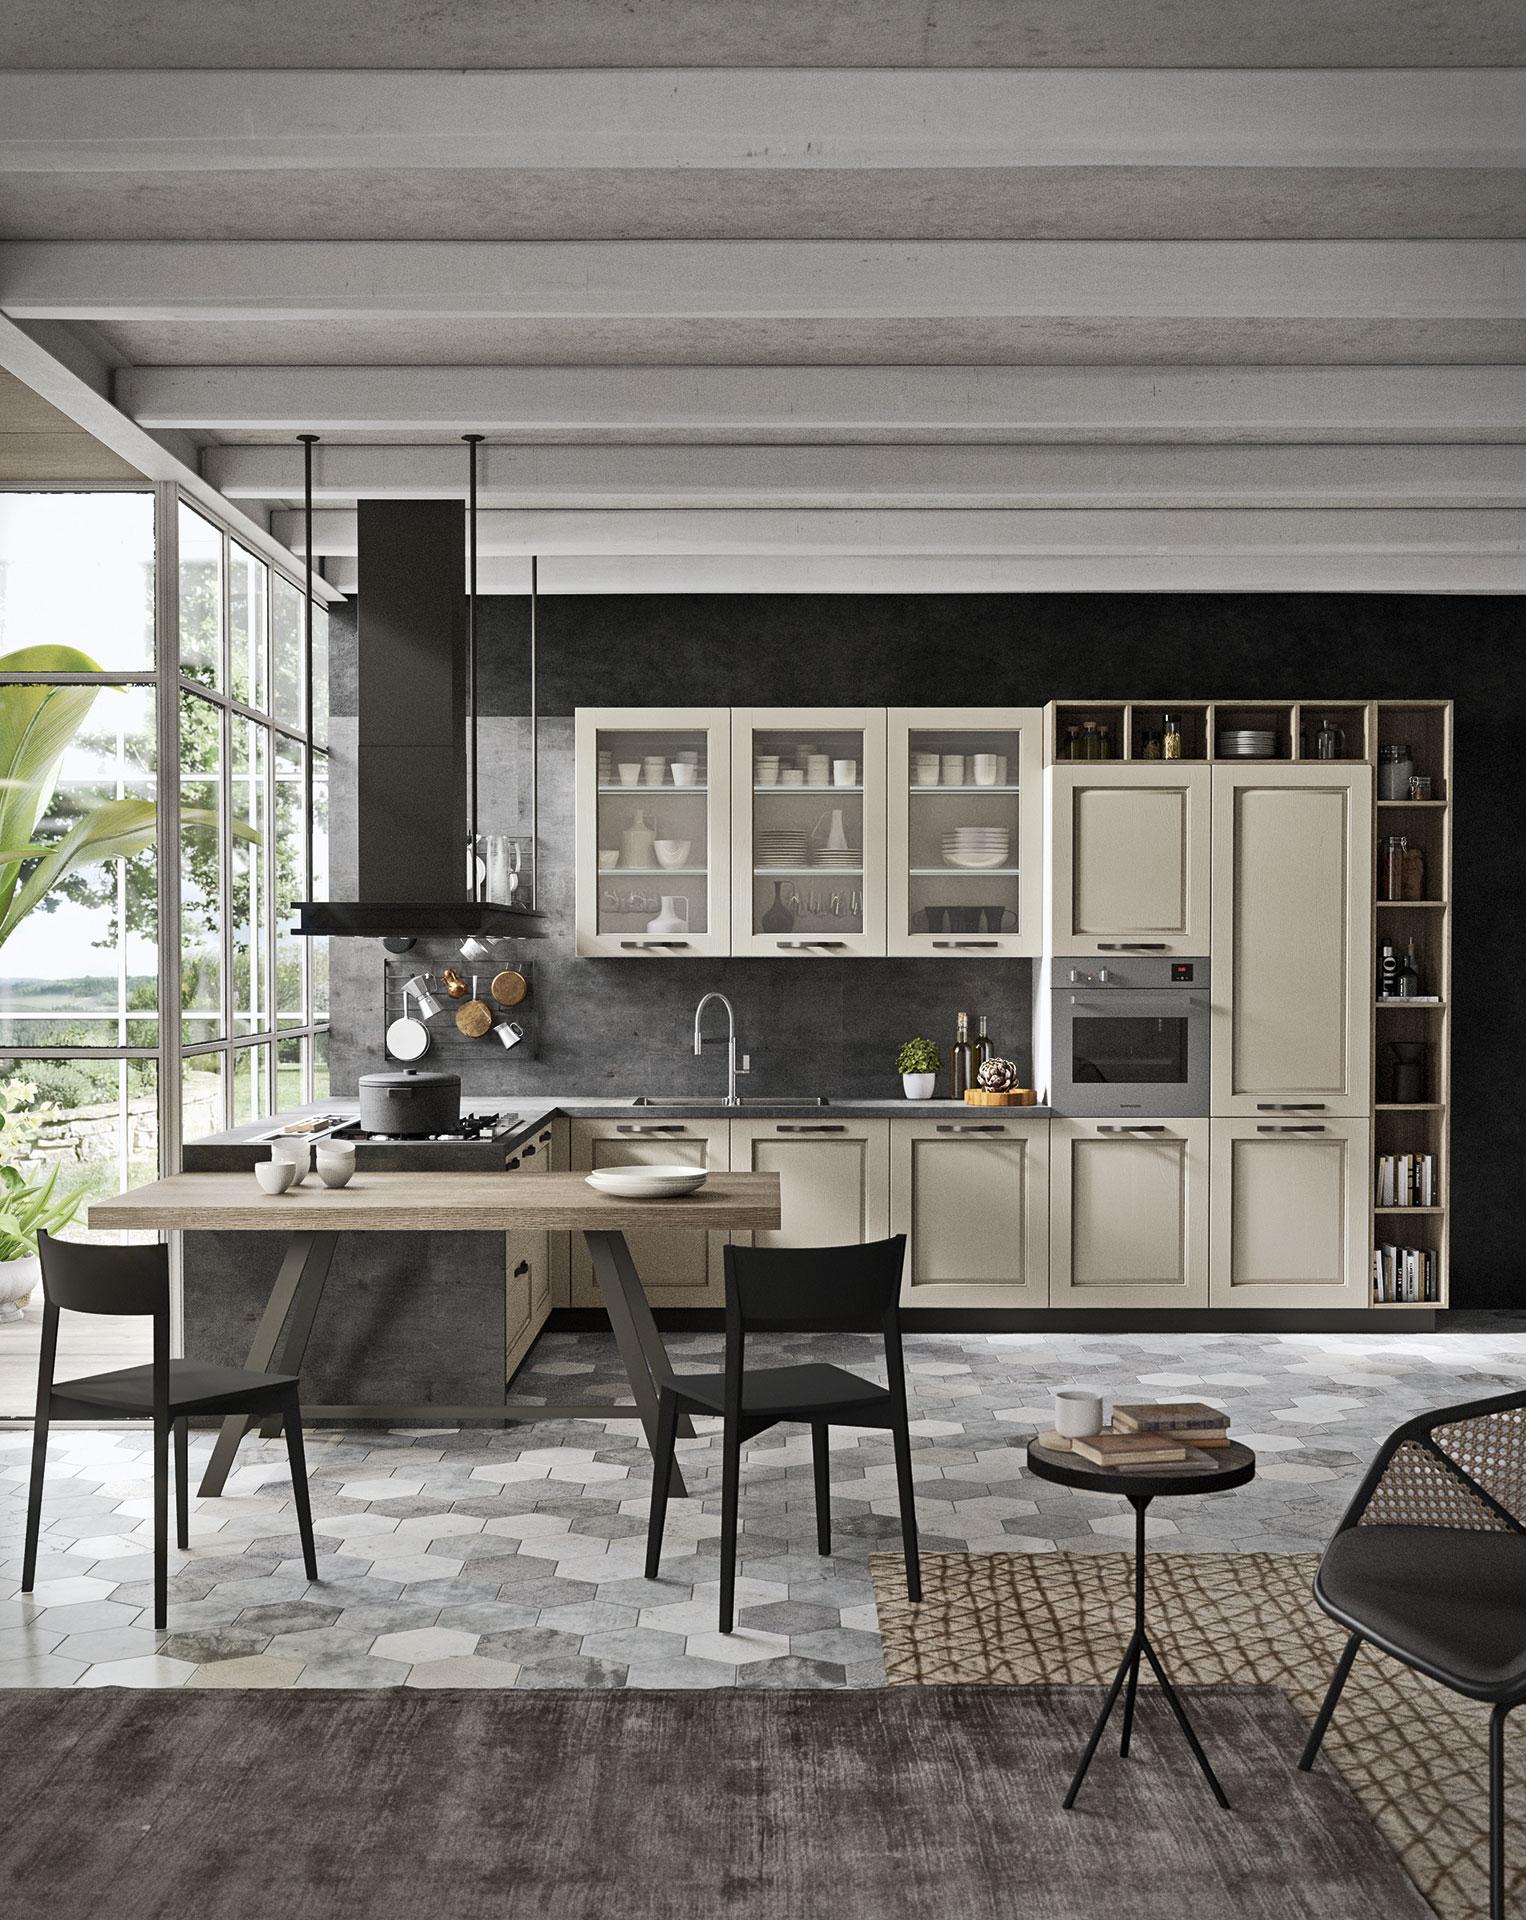 Antares arreda - Cucine moderne da sogno ...